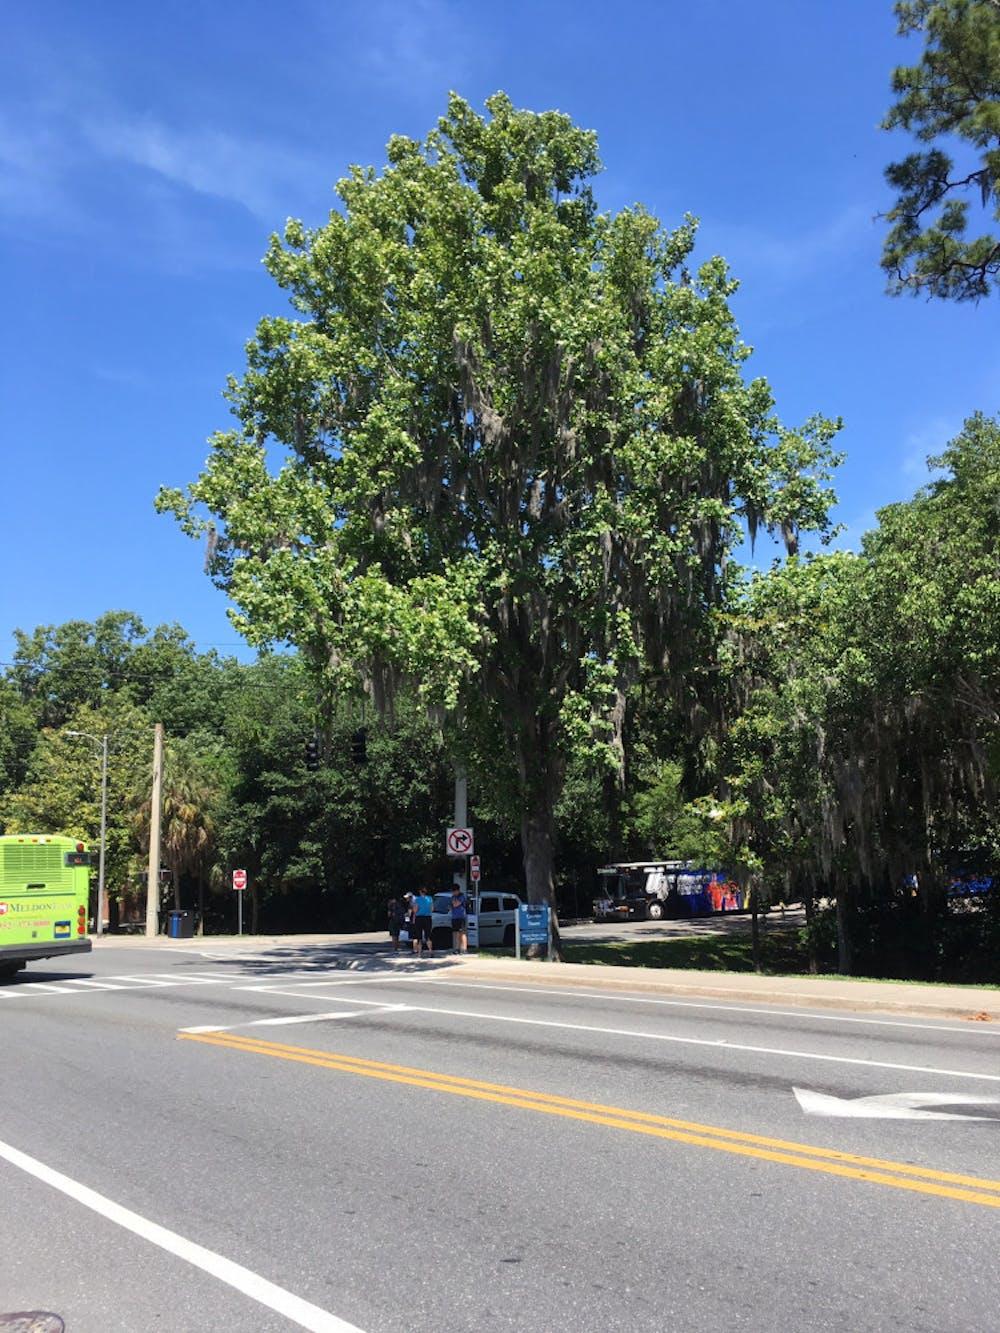 <p><span>UF's moon tree is near the J. Wayne Reitz Union Bus Loop.</span></p>